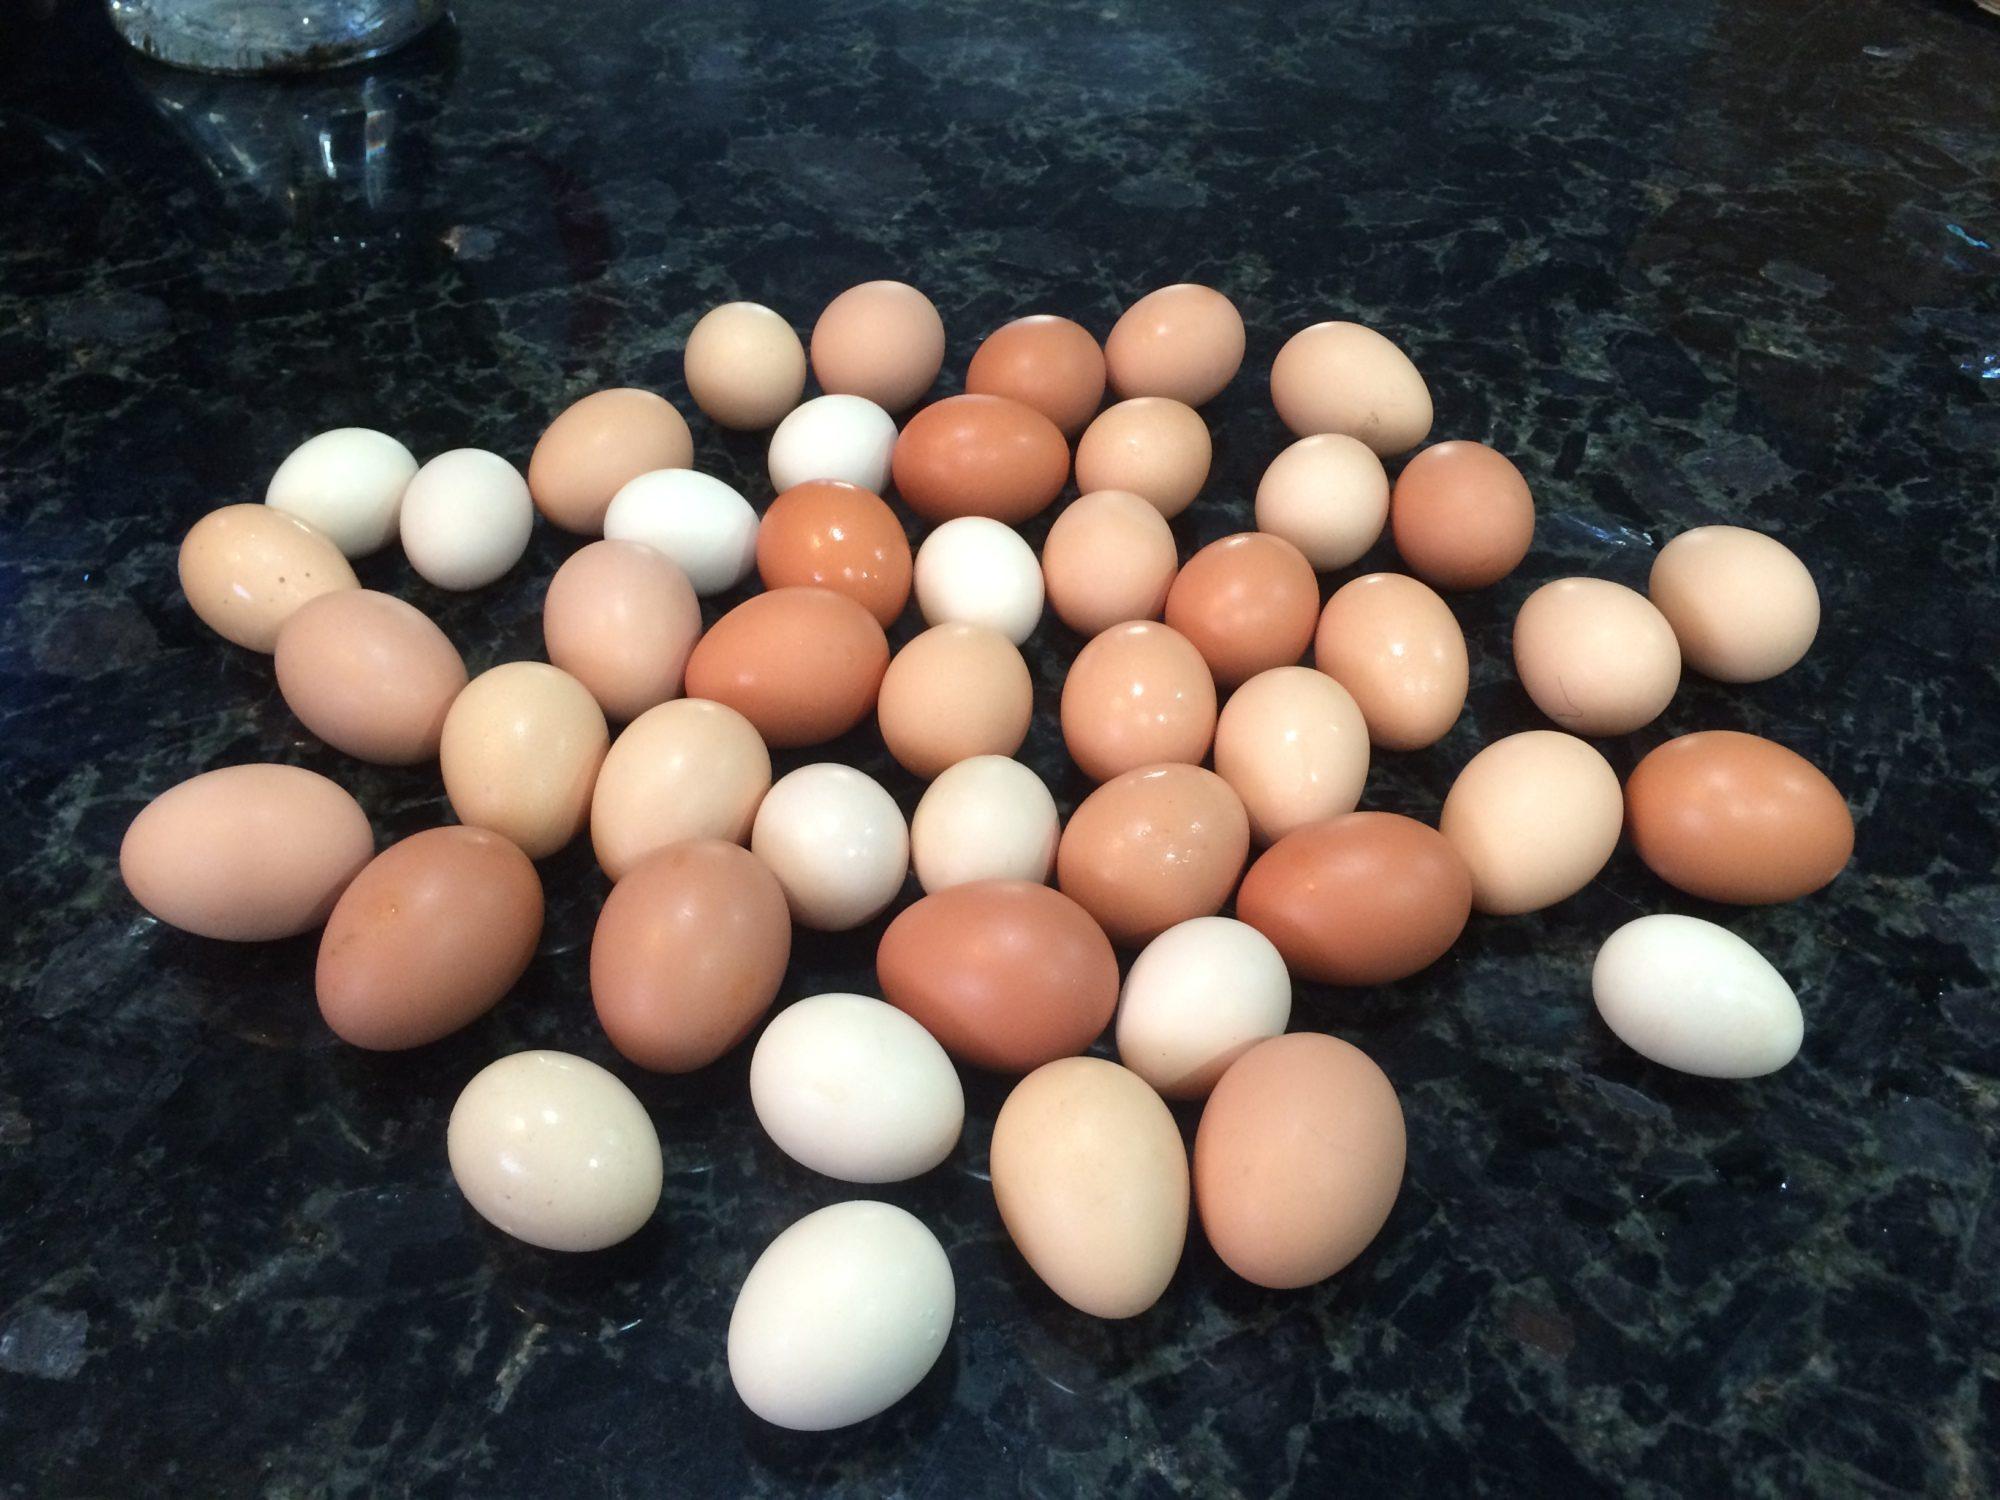 egg overload